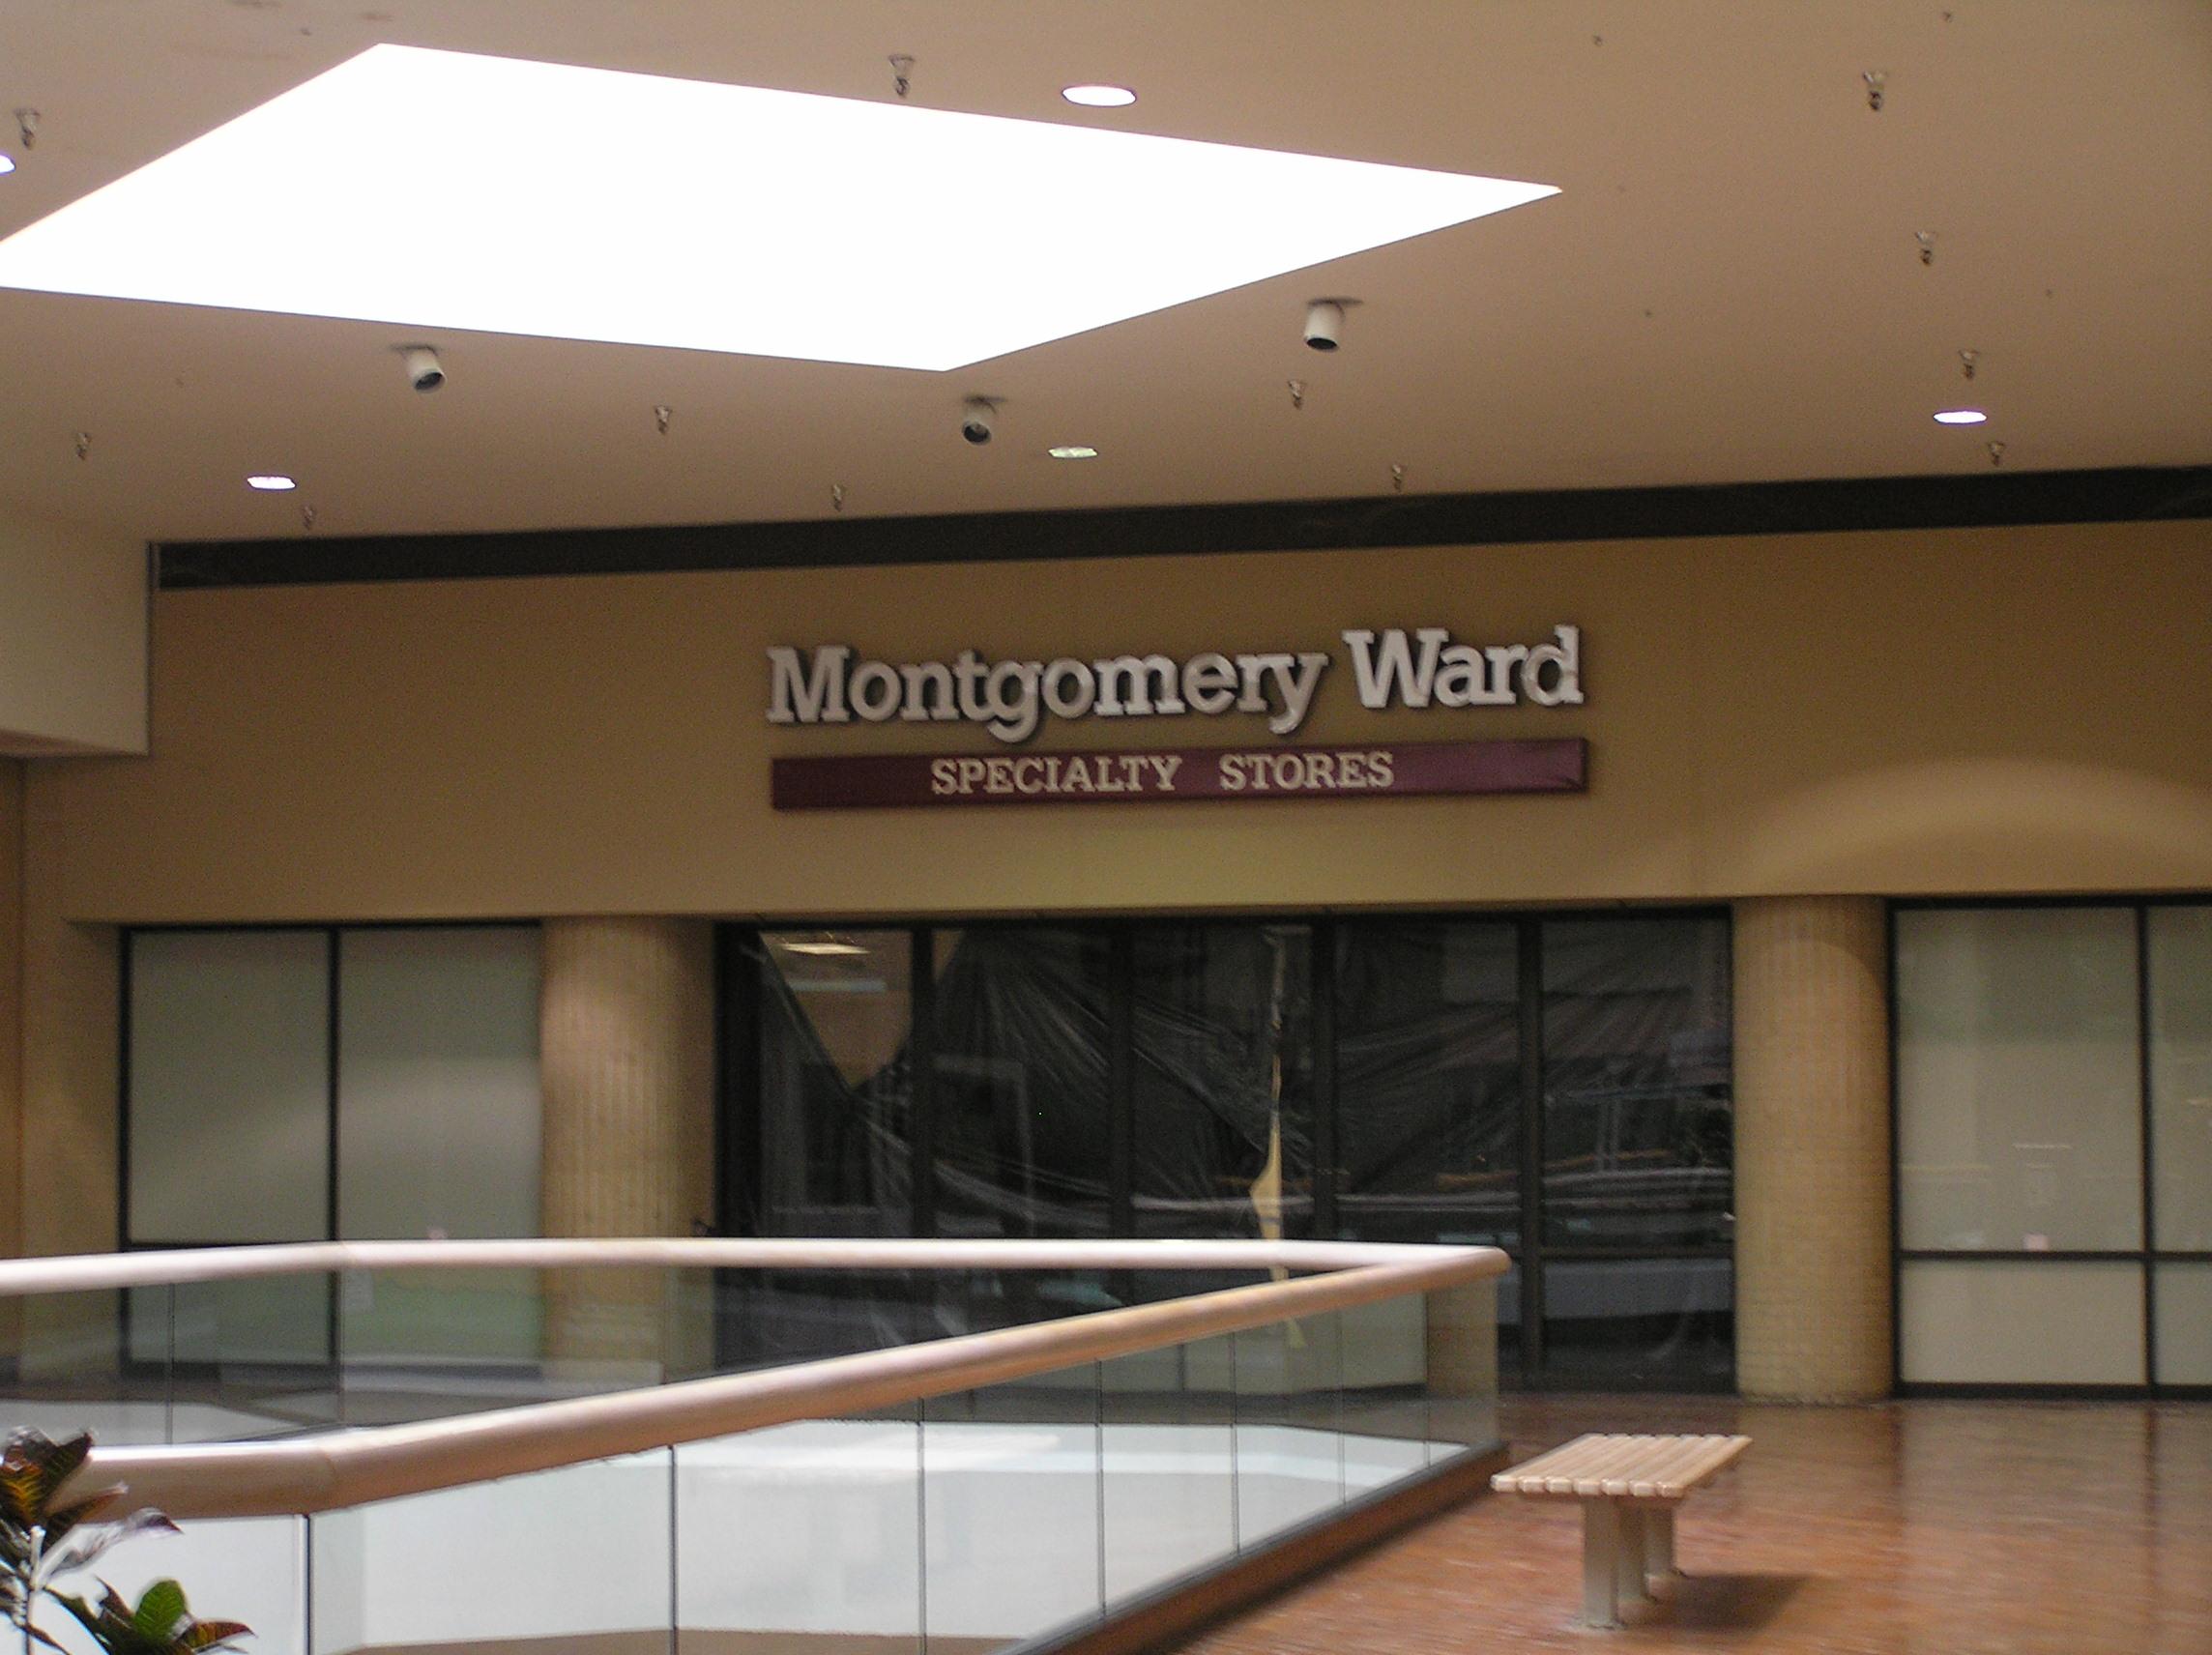 16-monty-wards.JPG